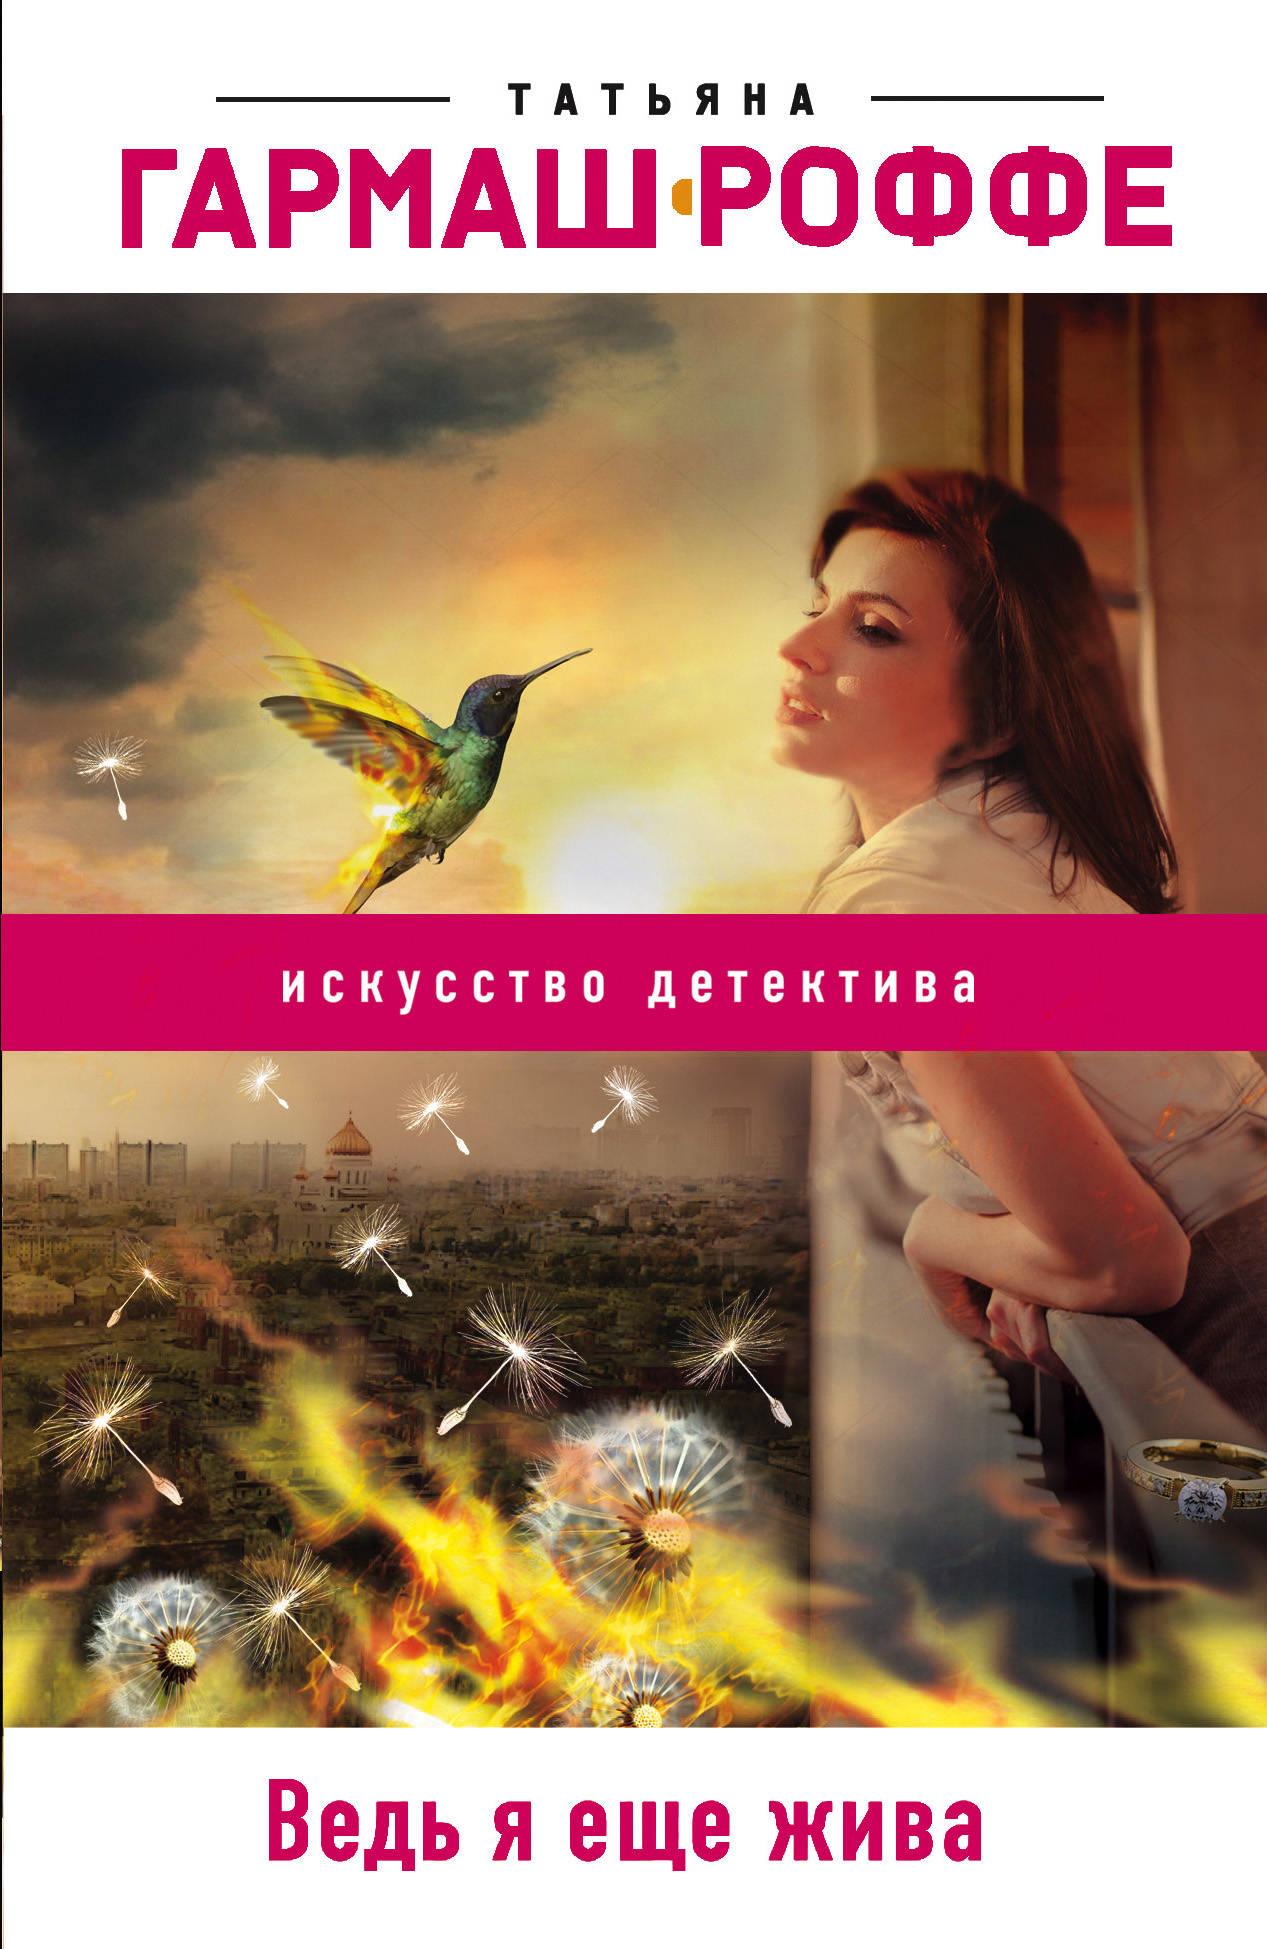 Татьяна Гармаш-Роффе Ведь я еще жива